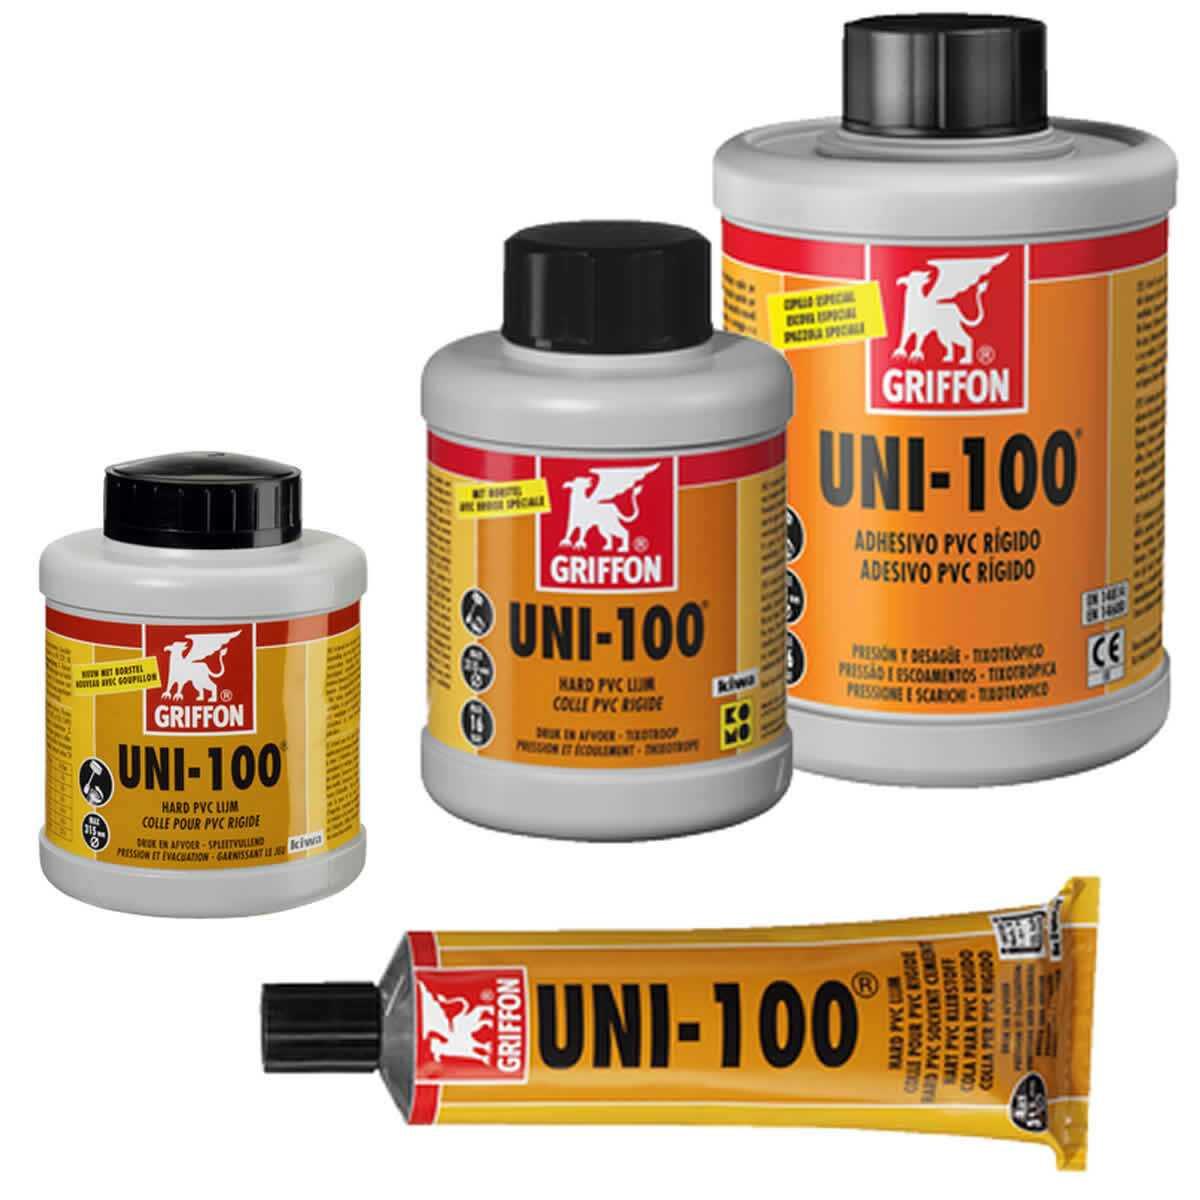 Griffon Uni-100 lepidlo 125g